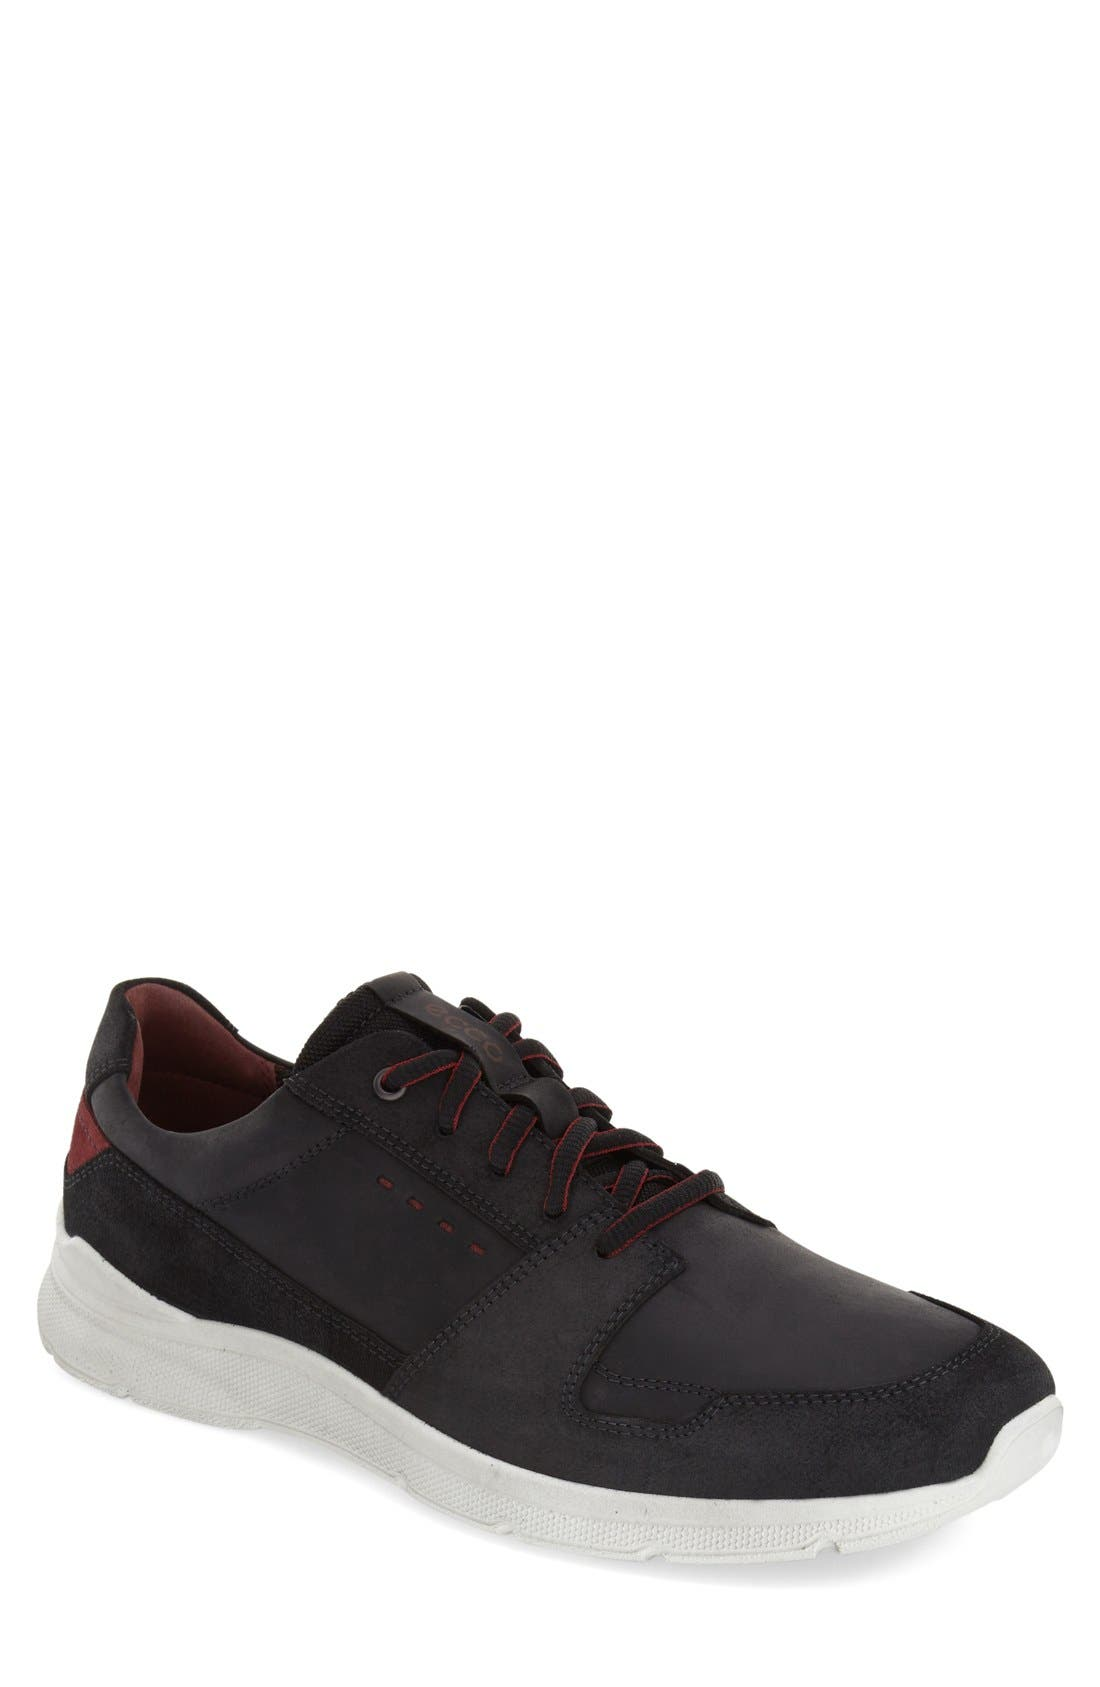 Main Image - ECCO 'Irondale - Retro' Sneaker (Men)